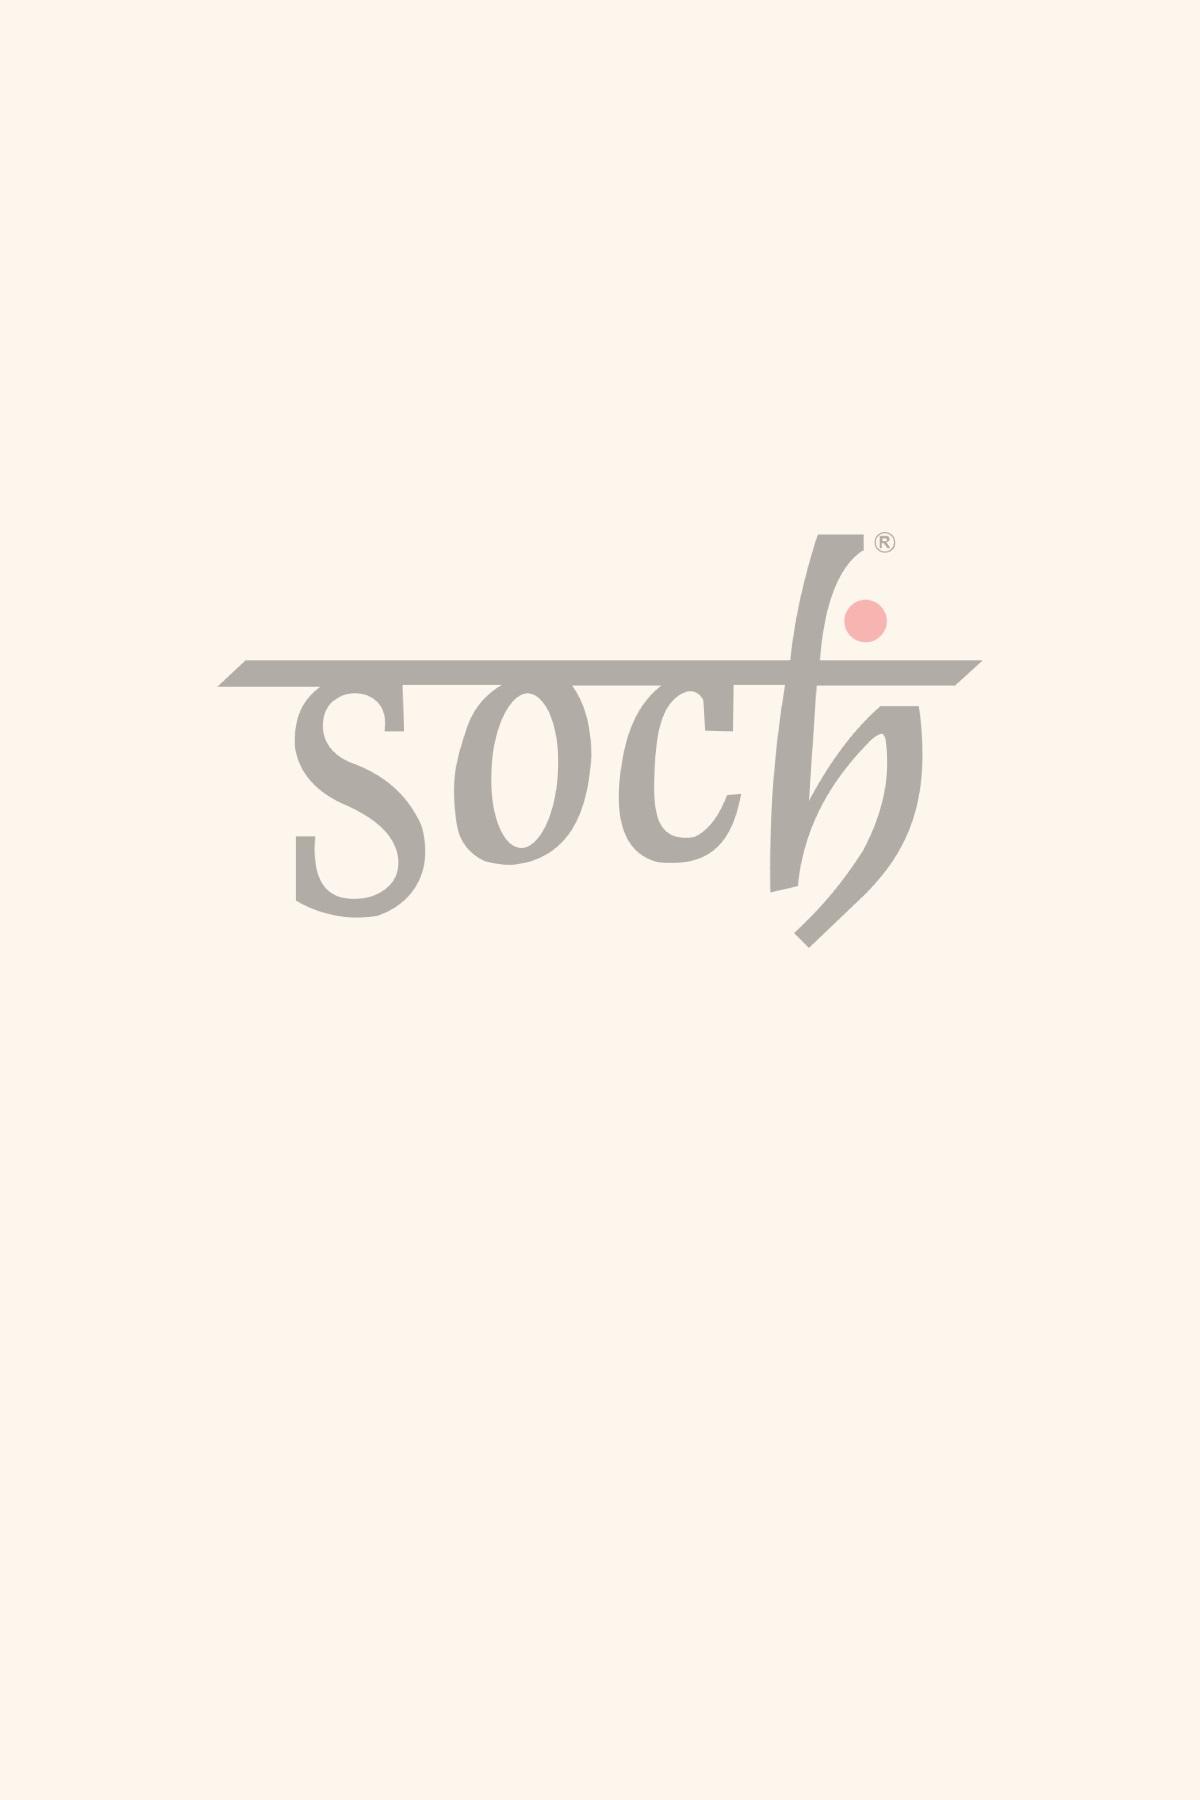 269a3416f3 More Views. Soch Silver Grey And Black Embroidered Chanderi Dress Materials  - SAIZ RTS 31007